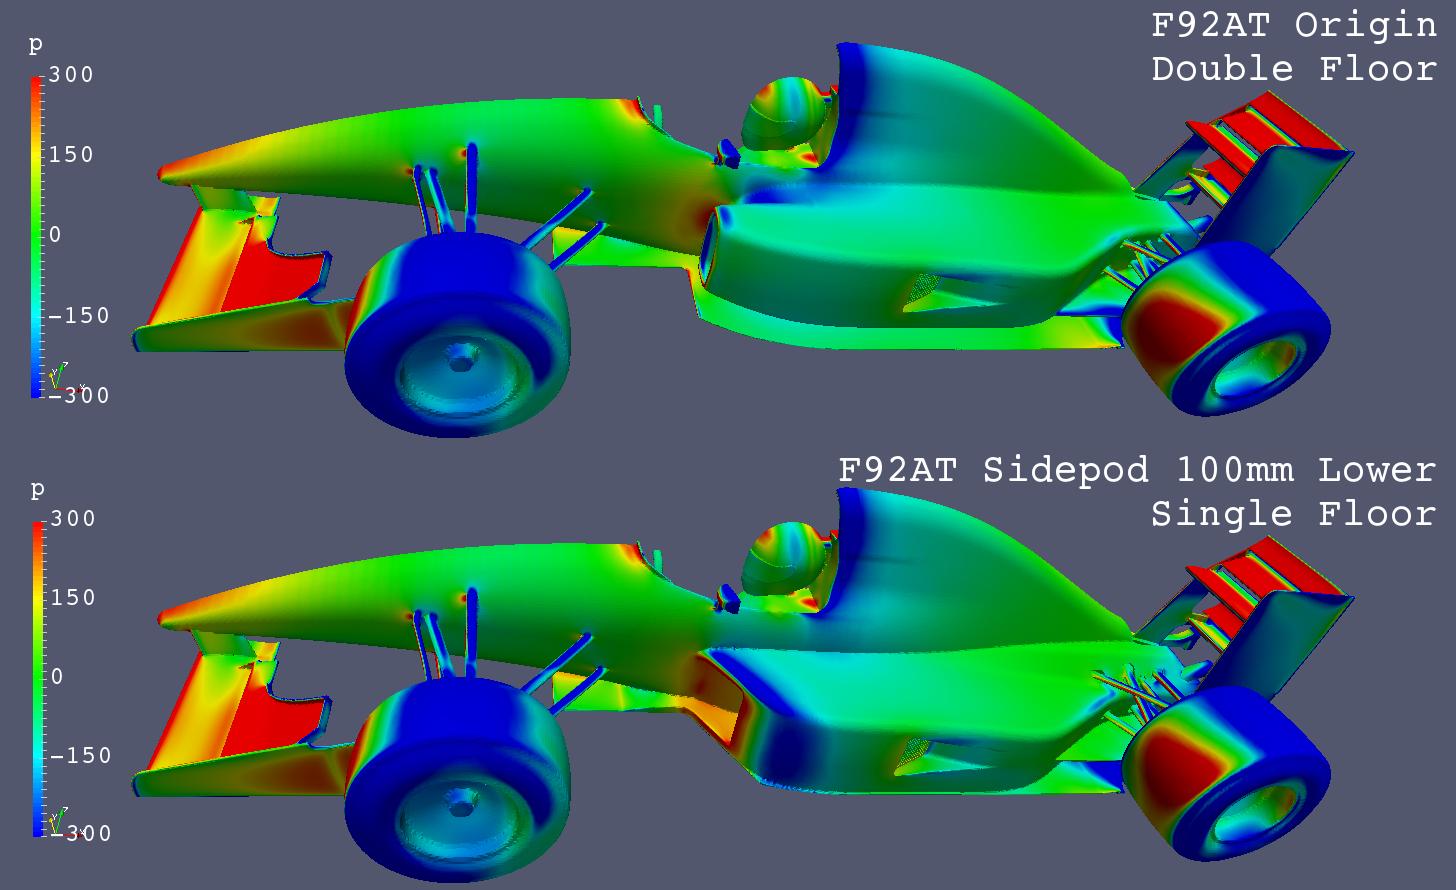 f92at_cfd_single-double-floor_pressure-comparison_upper-left-view